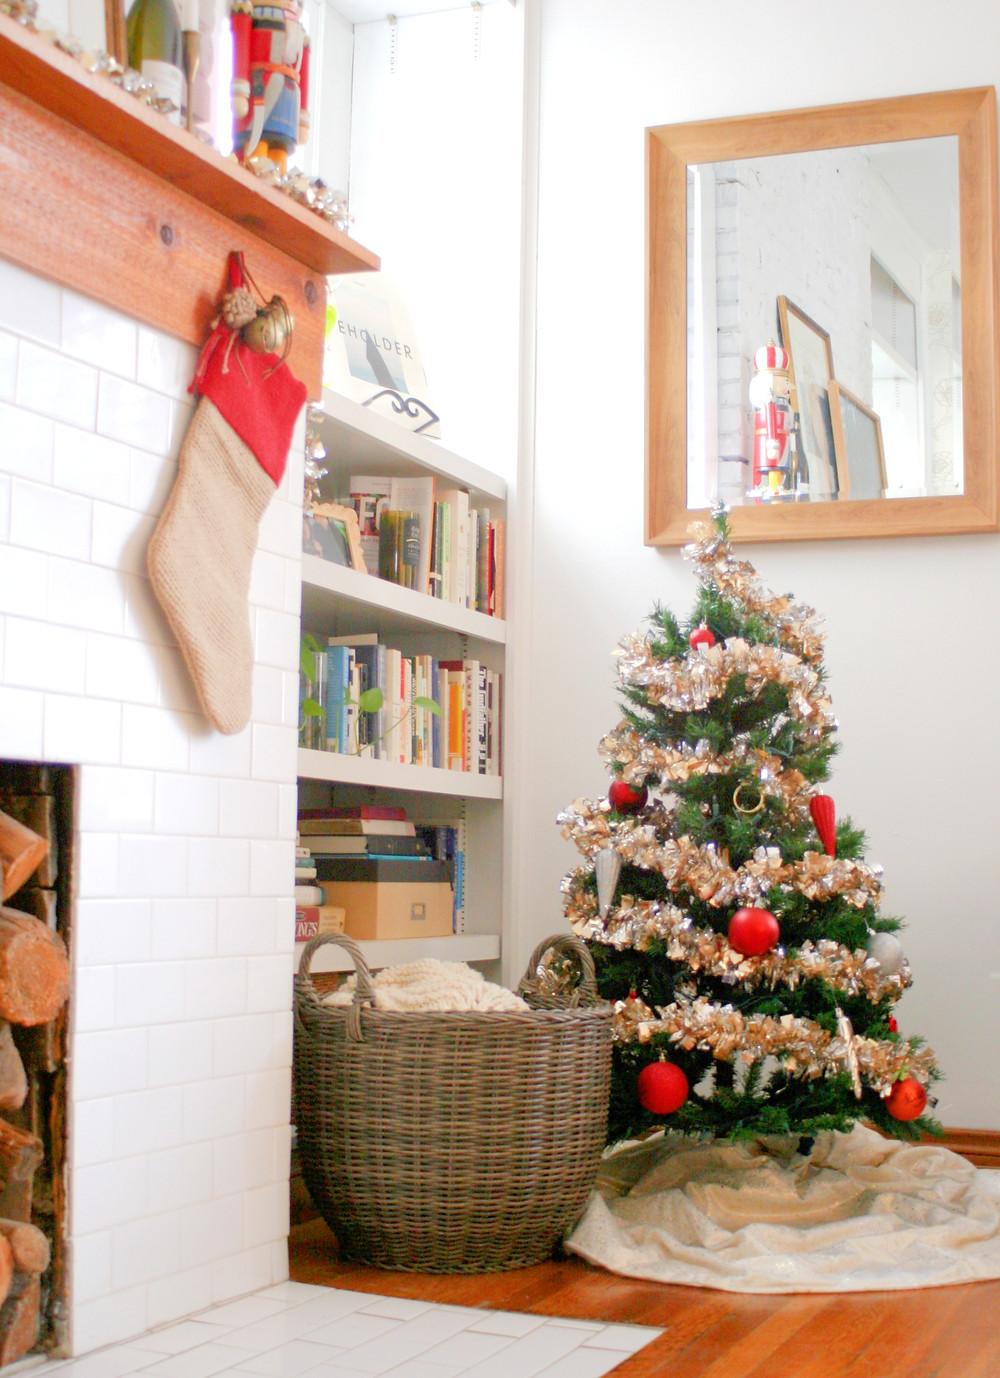 A tiny Christmas tree warming up the living room.